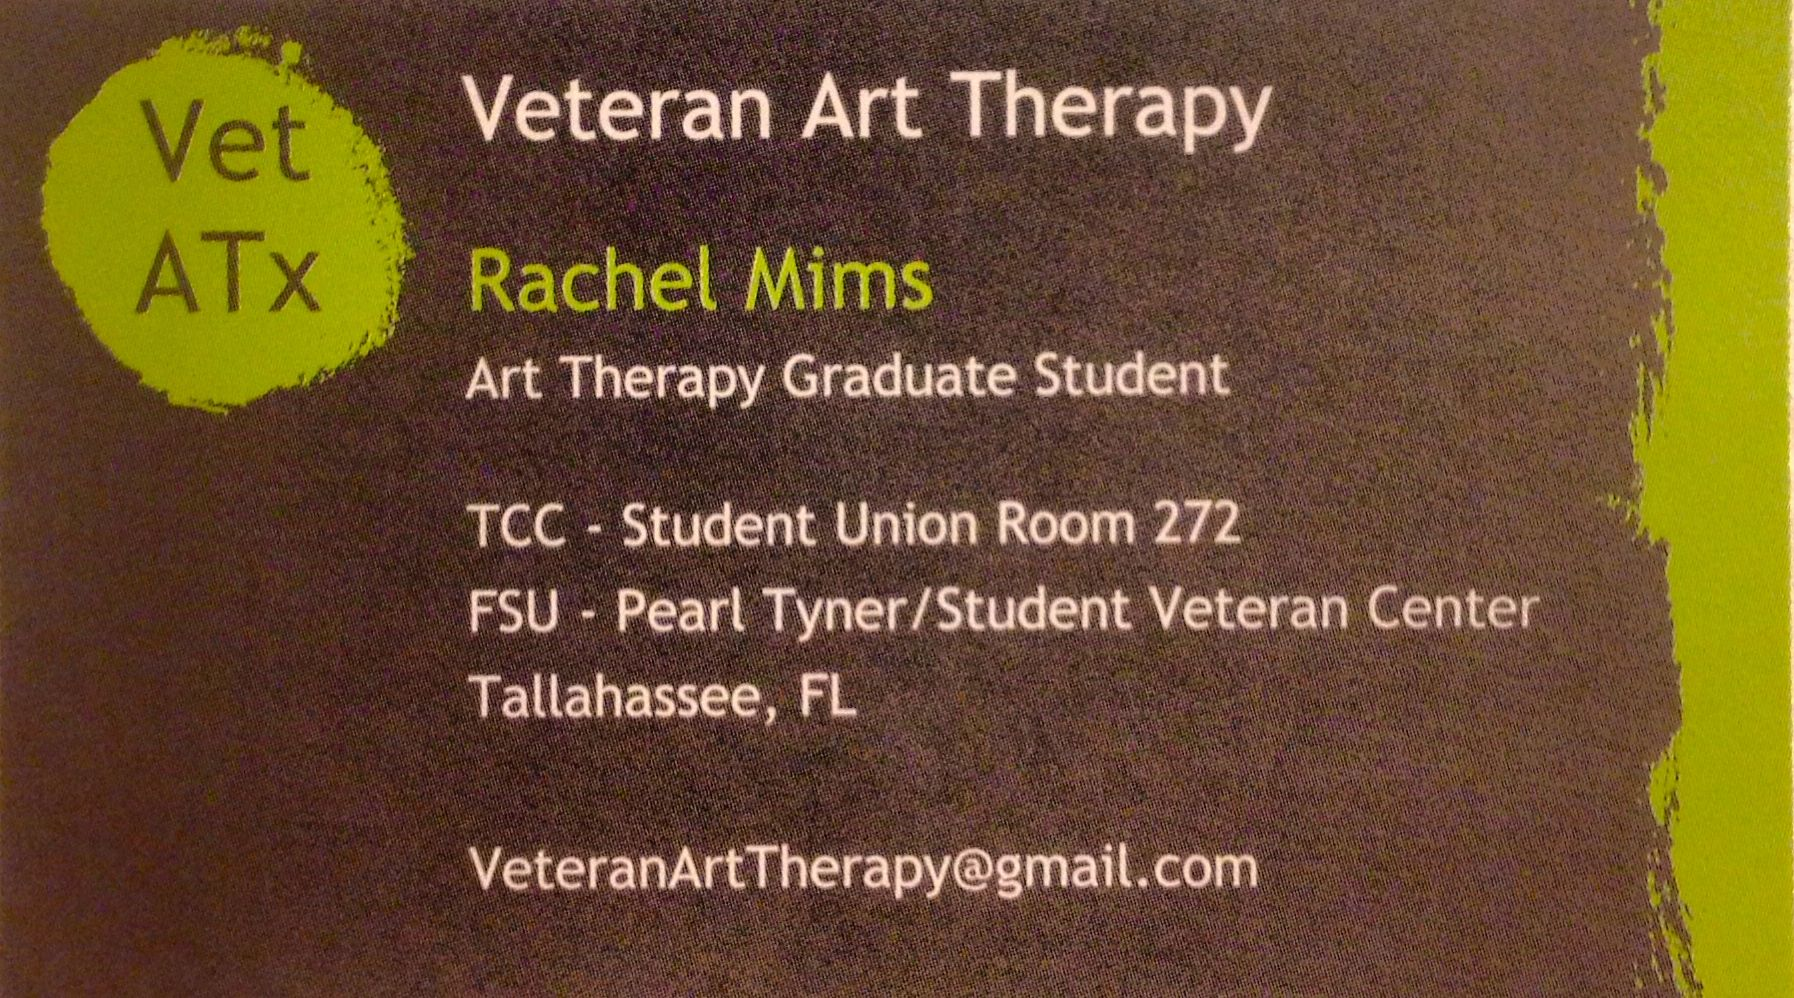 Rachel mims my business card for veteran art therapy essential rachel mims my business card for veteran art therapy colourmoves